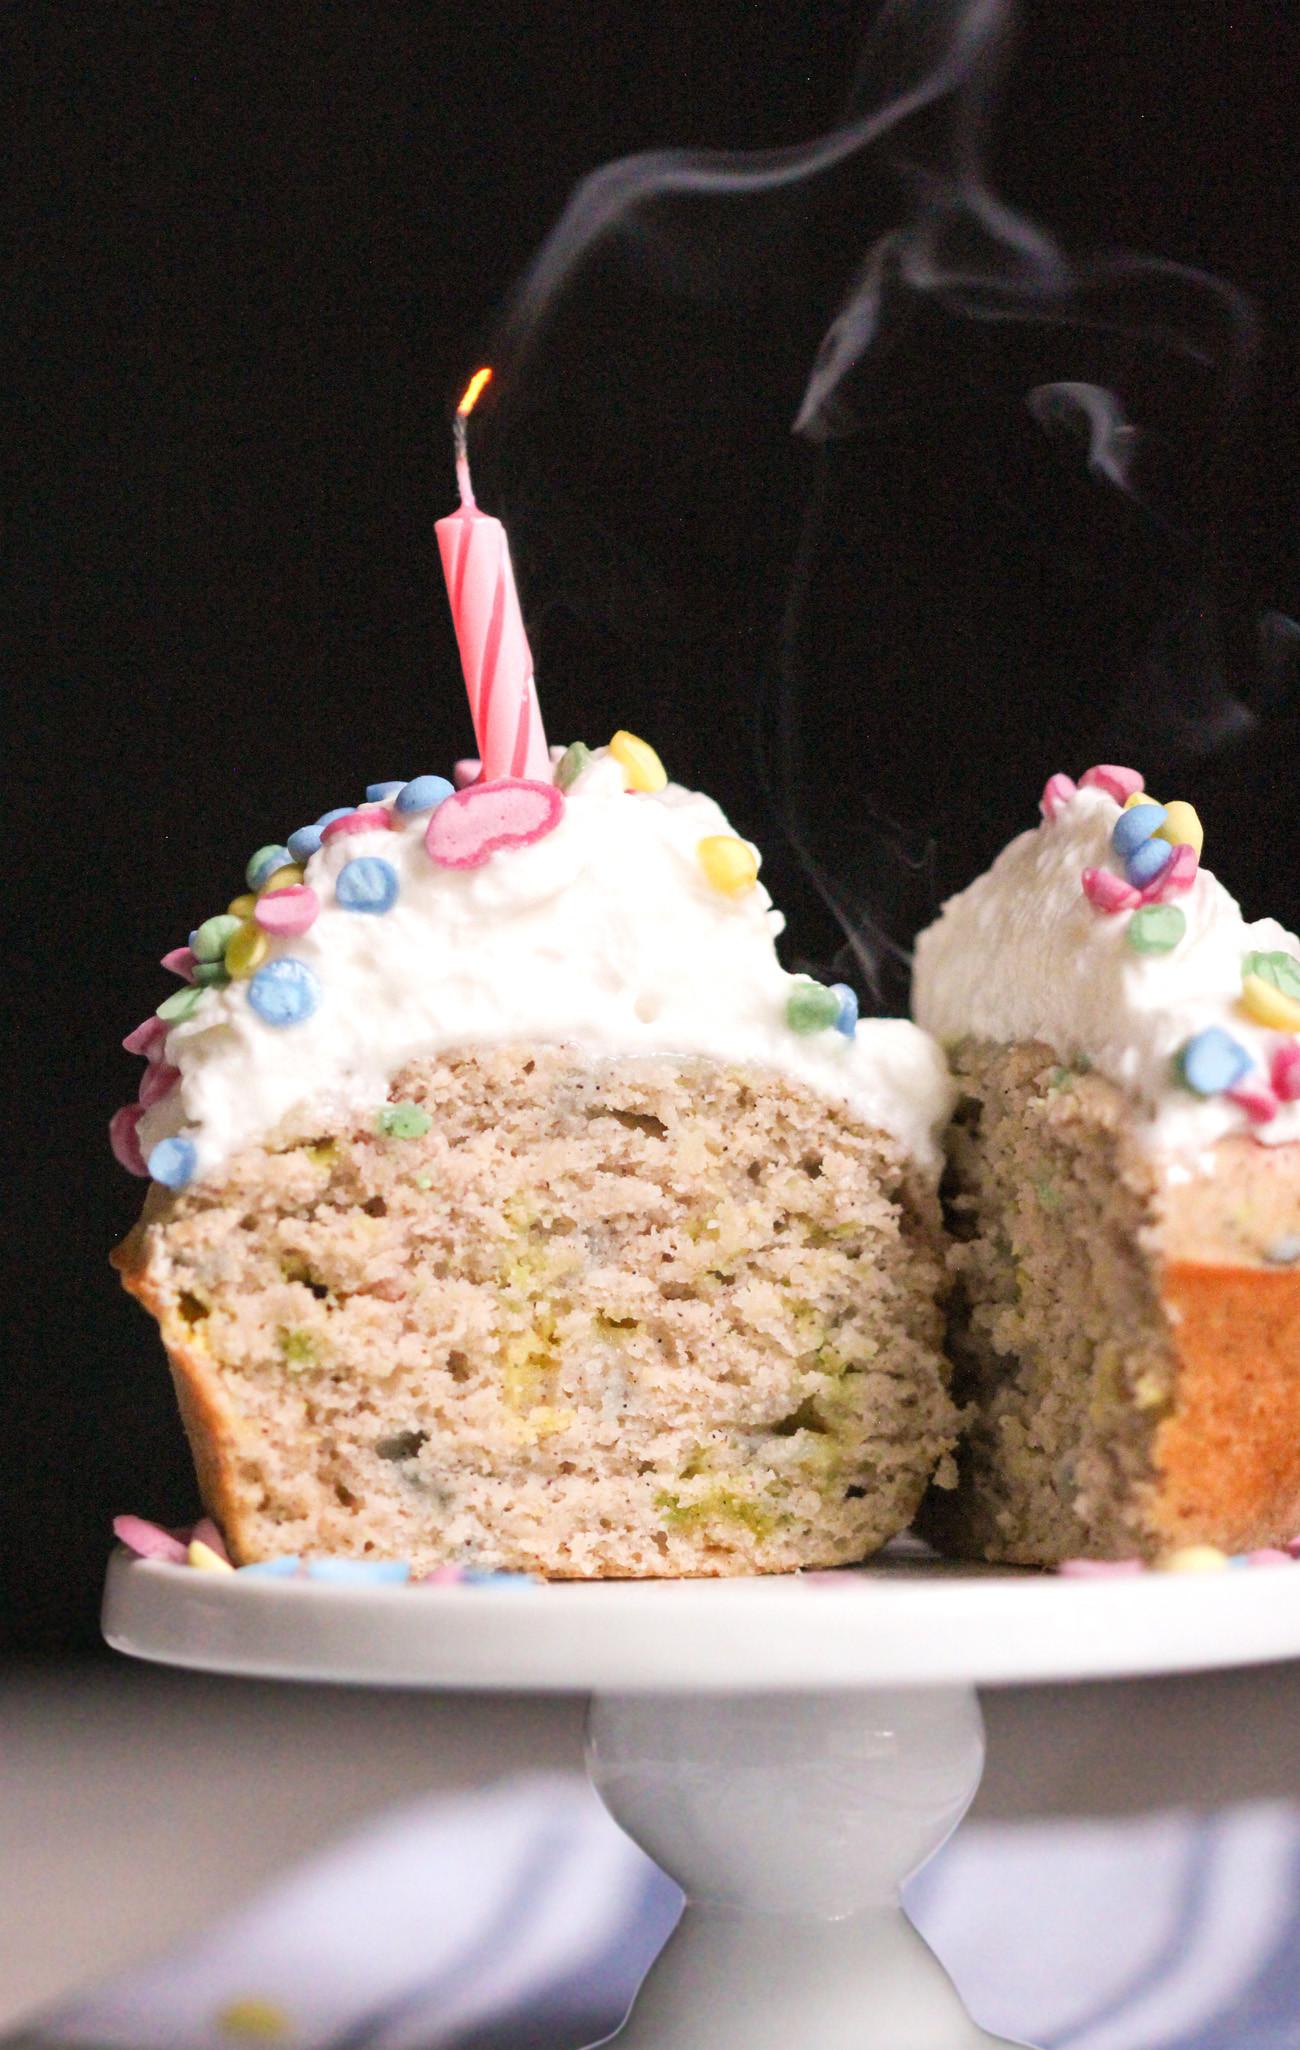 Healthy Low Fat Desserts  Healthy Funfetti Cupcakes Gluten Free Low Fat